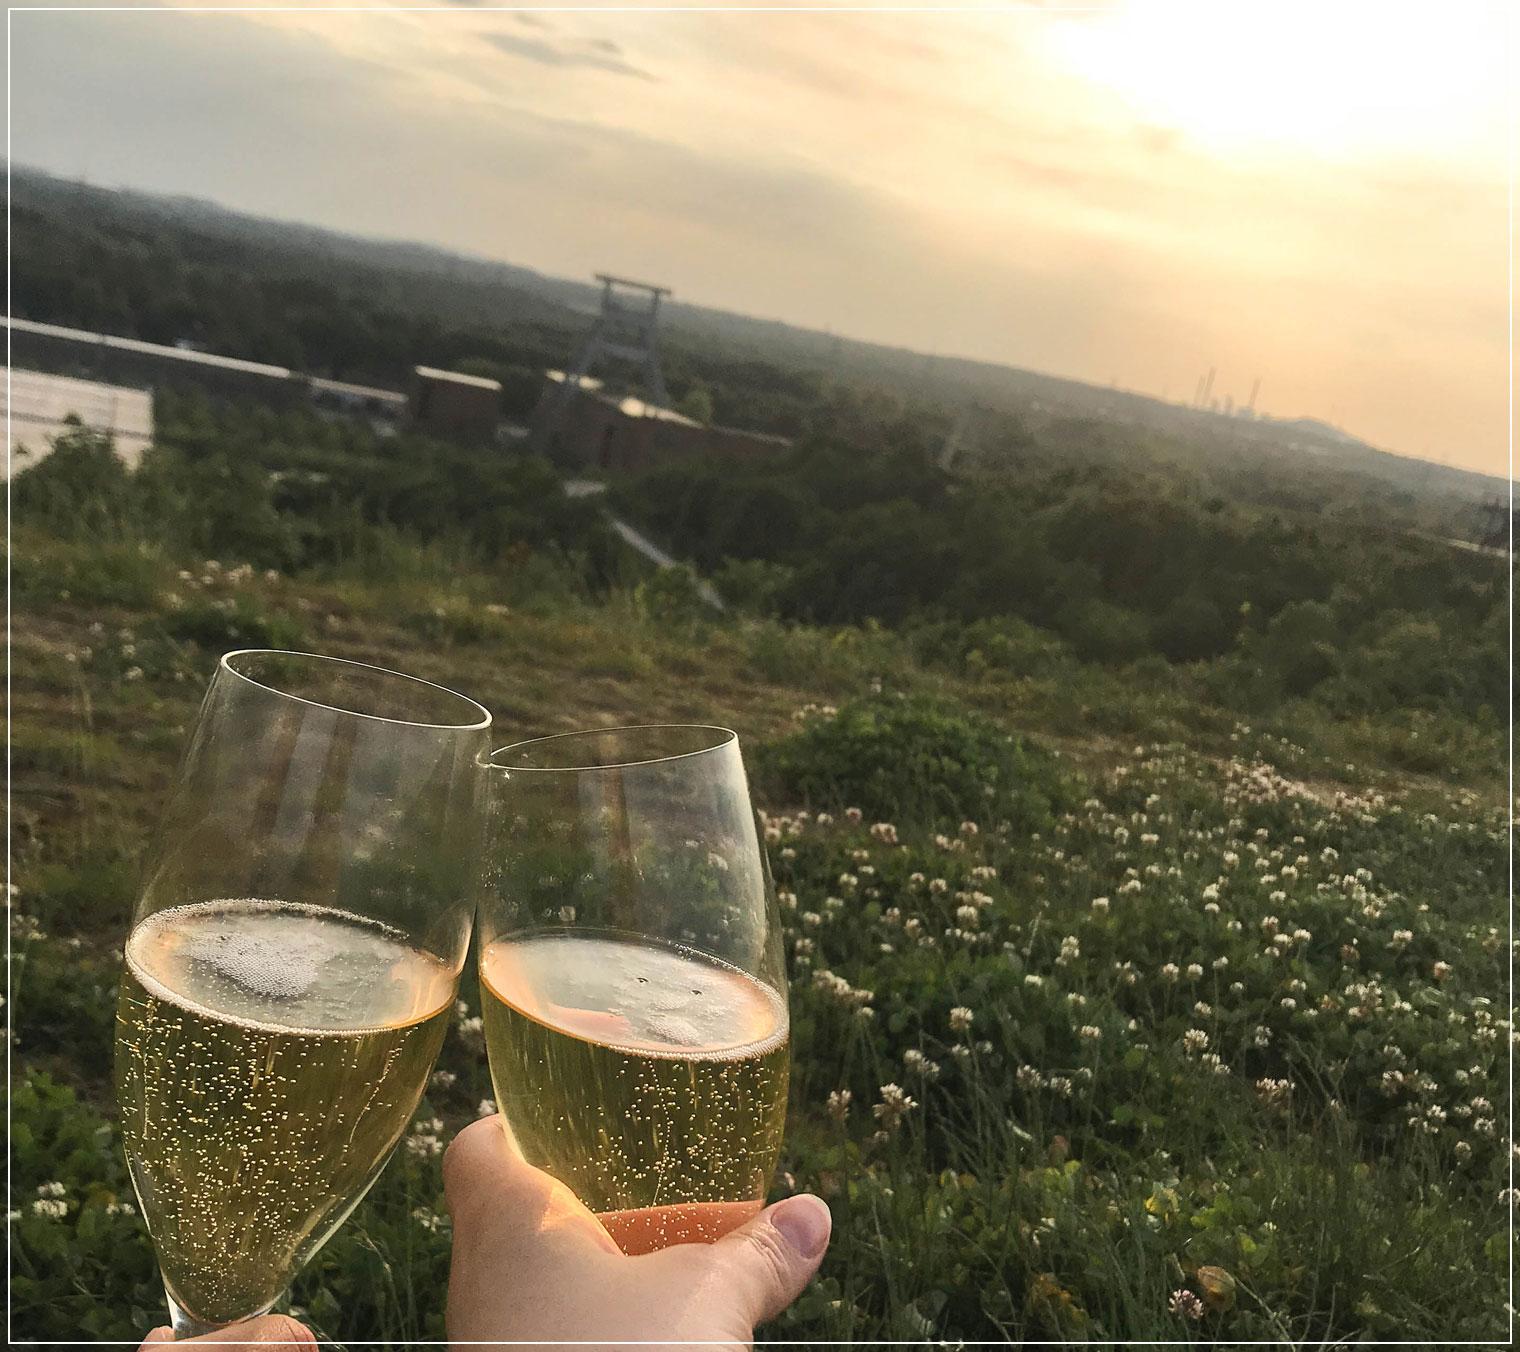 Heiratsantrag, heiraten, Ruhrpott Romantik, Hochzeit, Braut, Ruhrgebiet, Bloggerin, Modeblog, Fashionblog